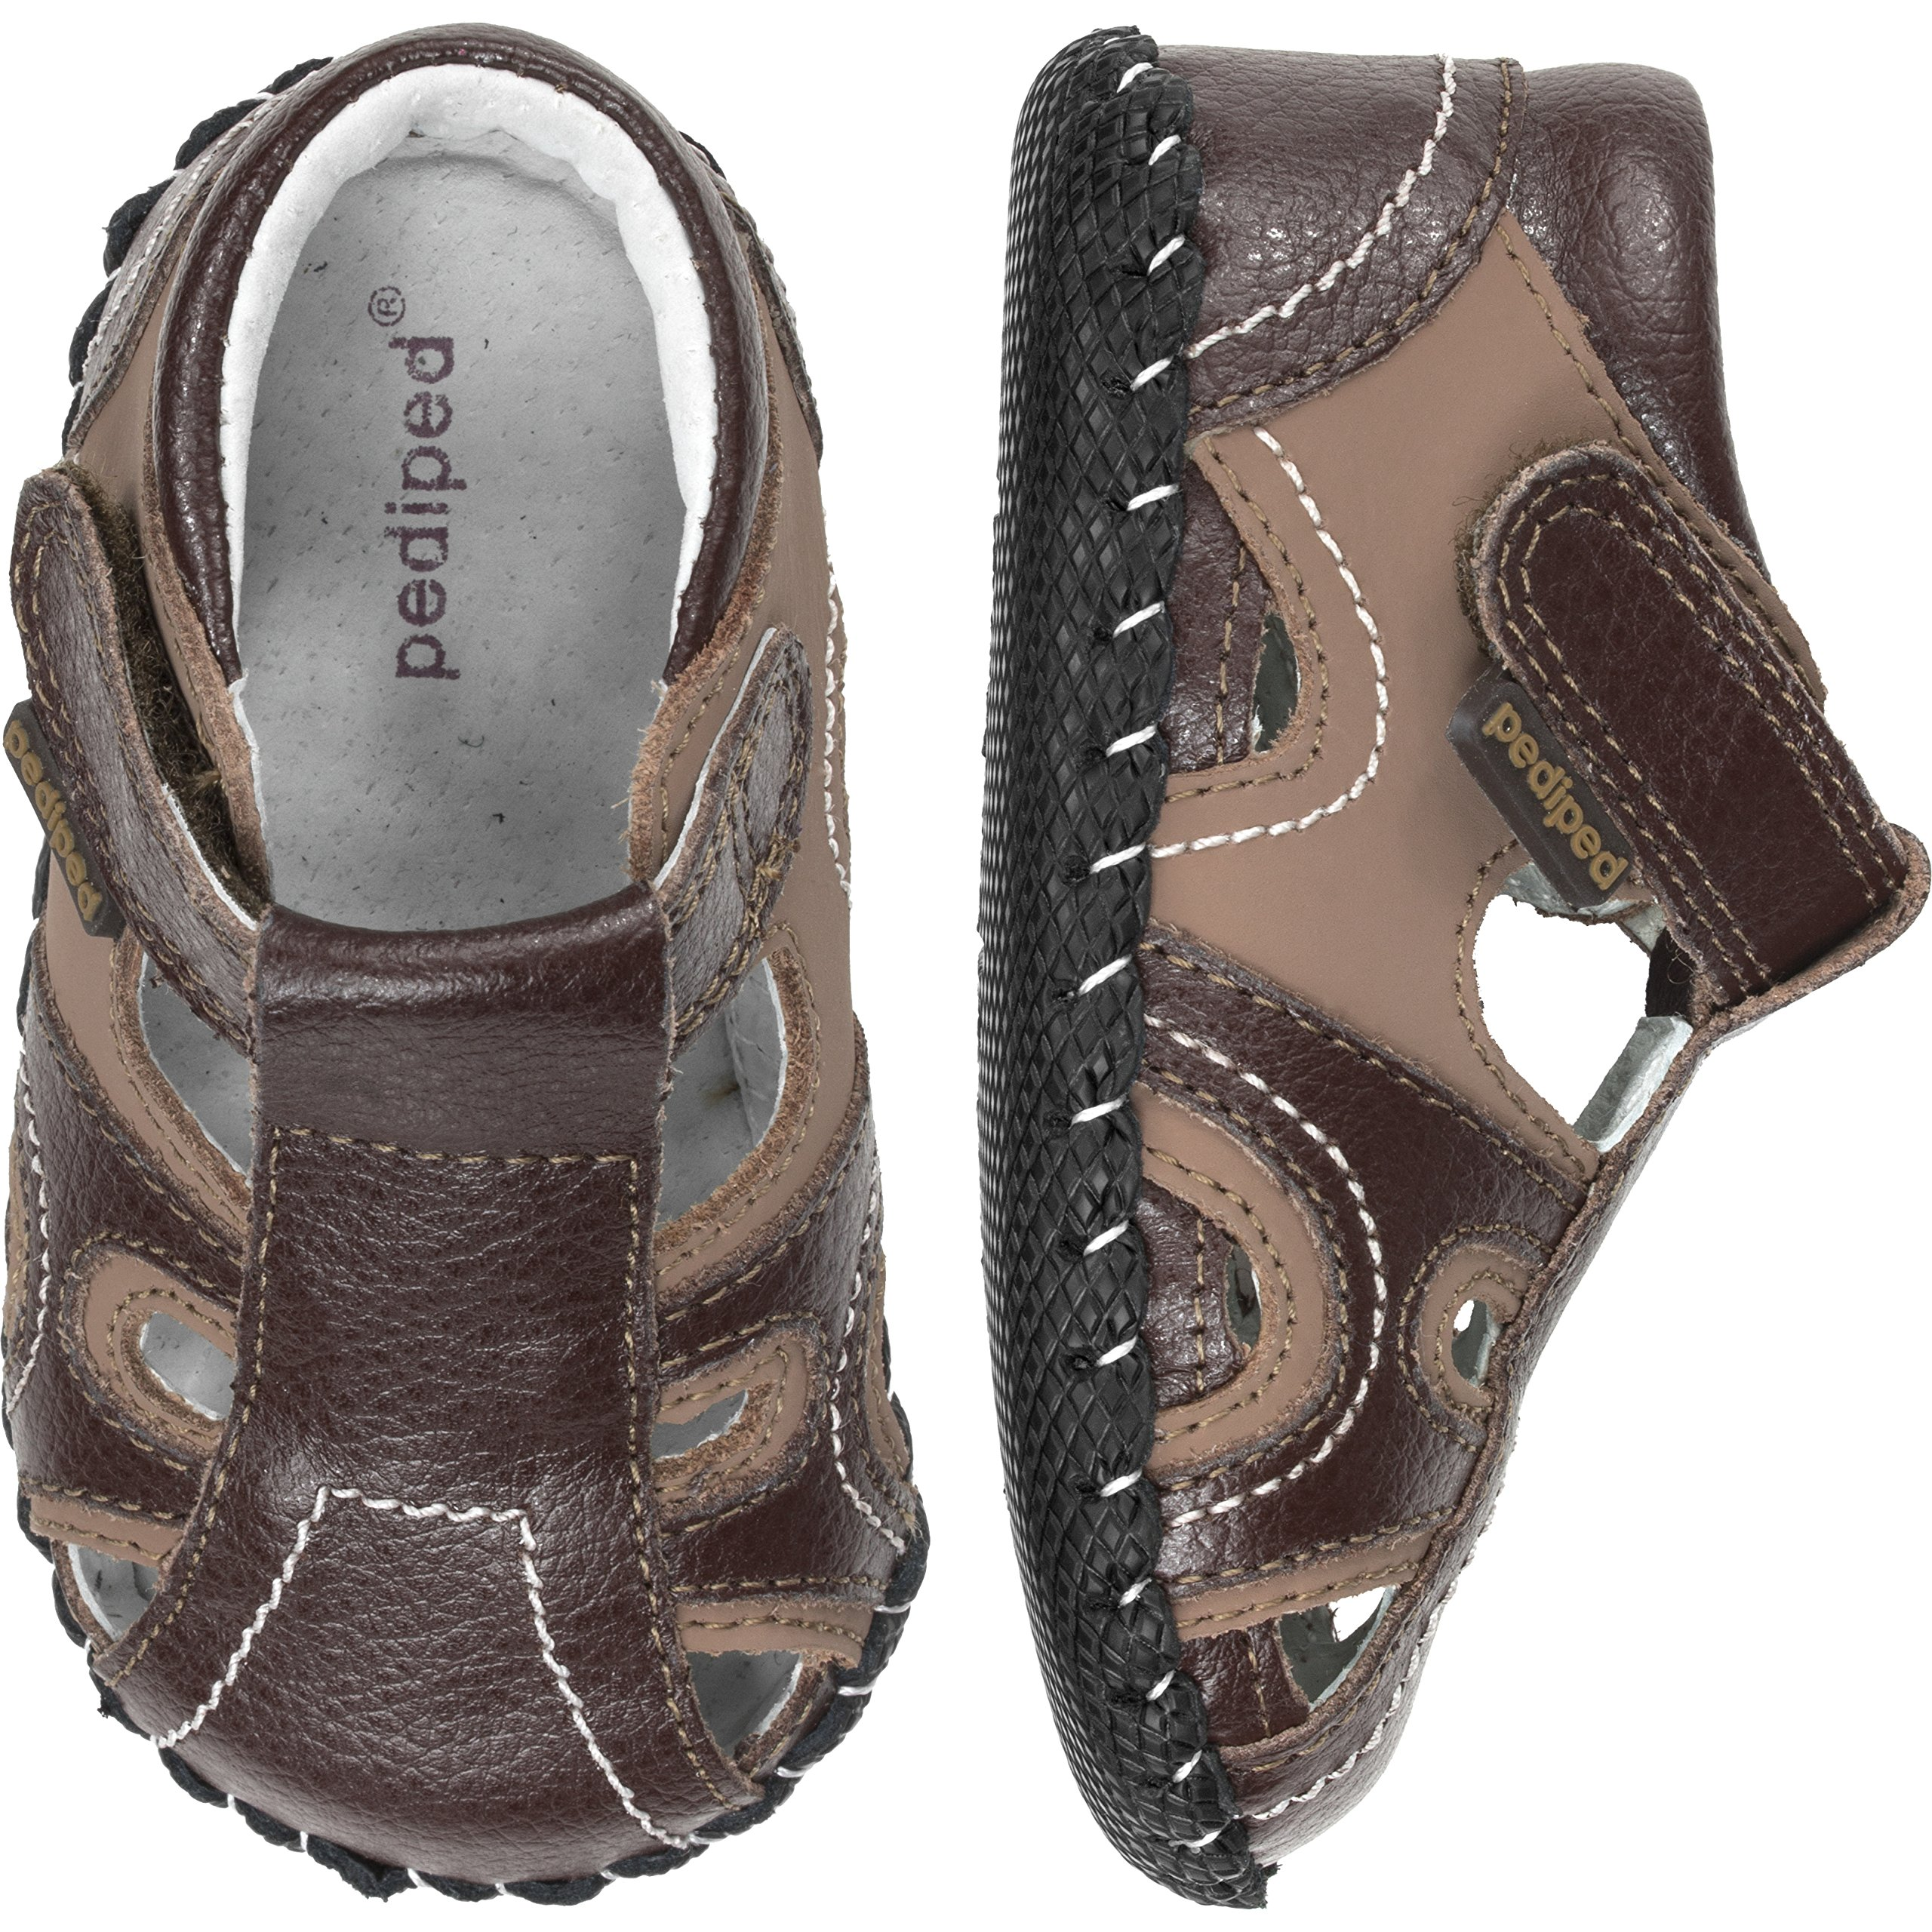 pediped Brody Originals Fisherman Sandal (Infant/Toddler),Brown Tan,Large (18-24 Months) by pediped